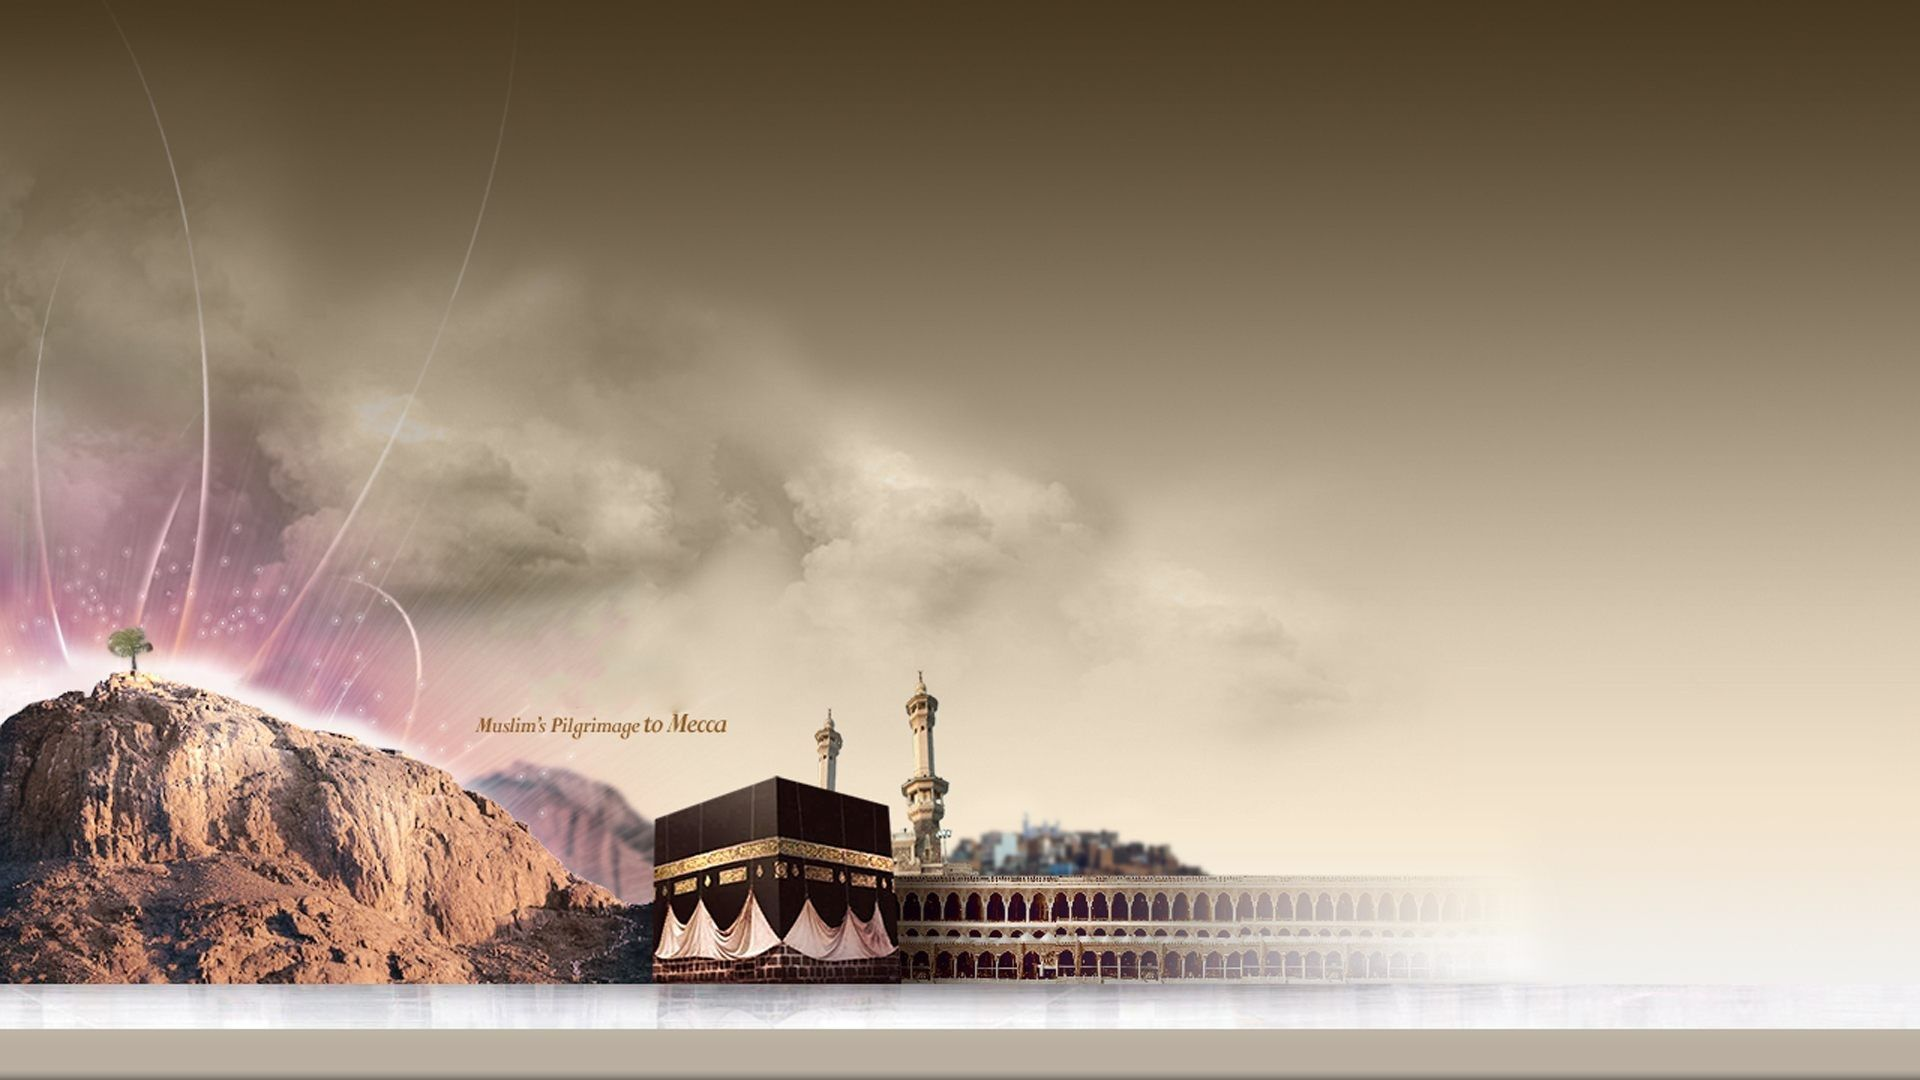 503 Service Unavailable Islamic Wallpaper Hd Islamic Wallpaper Mecca Wallpaper